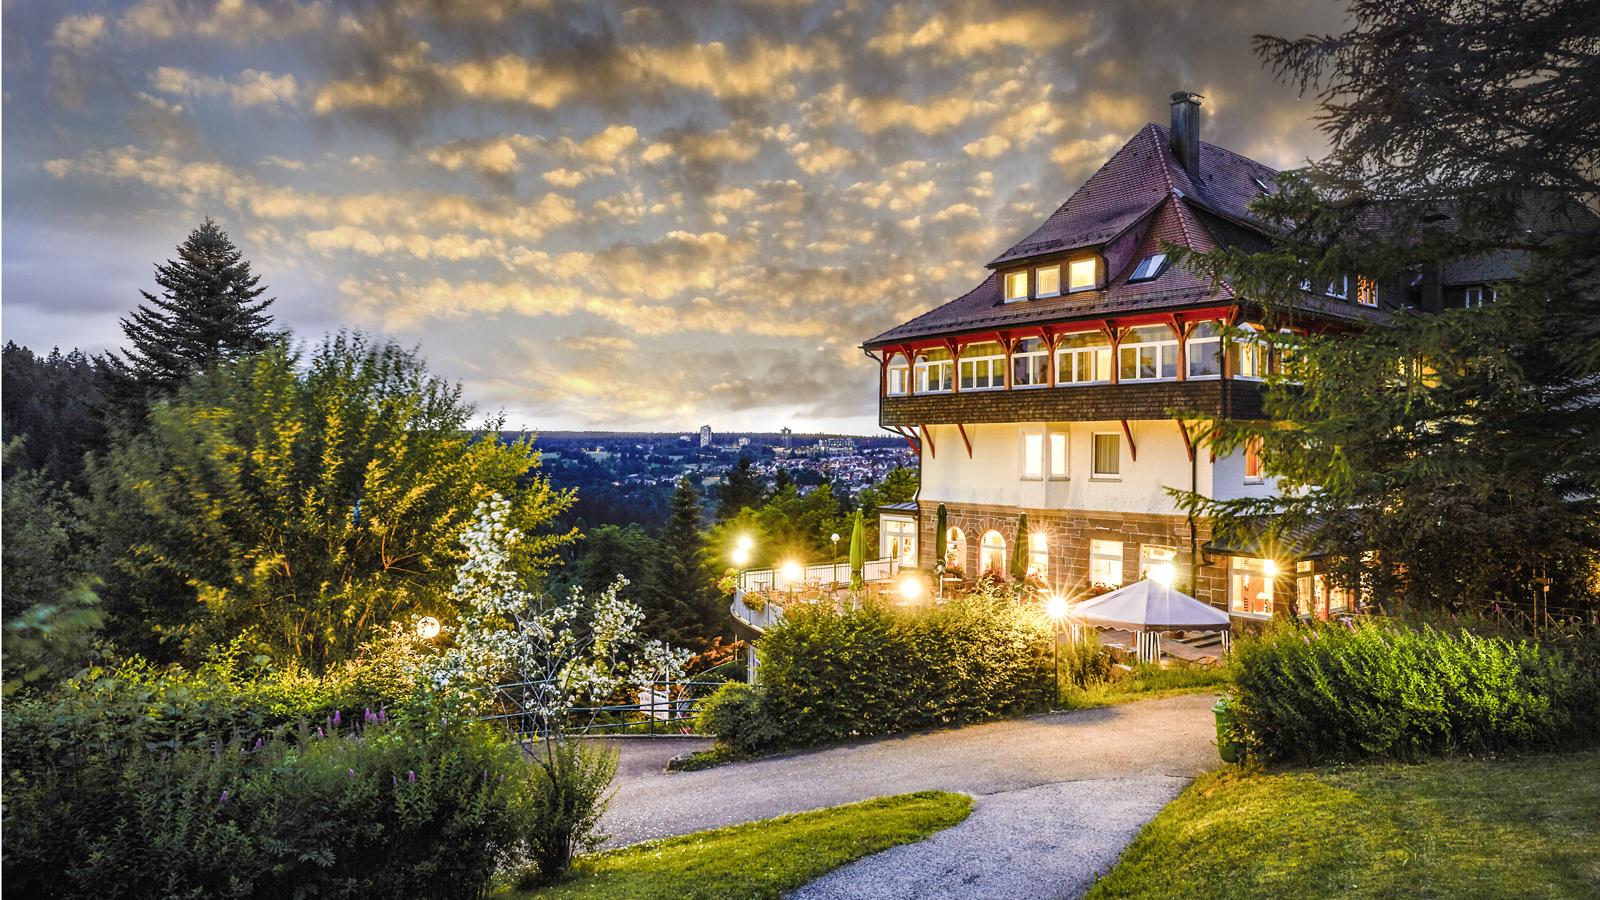 Bild 1 Hotel Teuchelwald